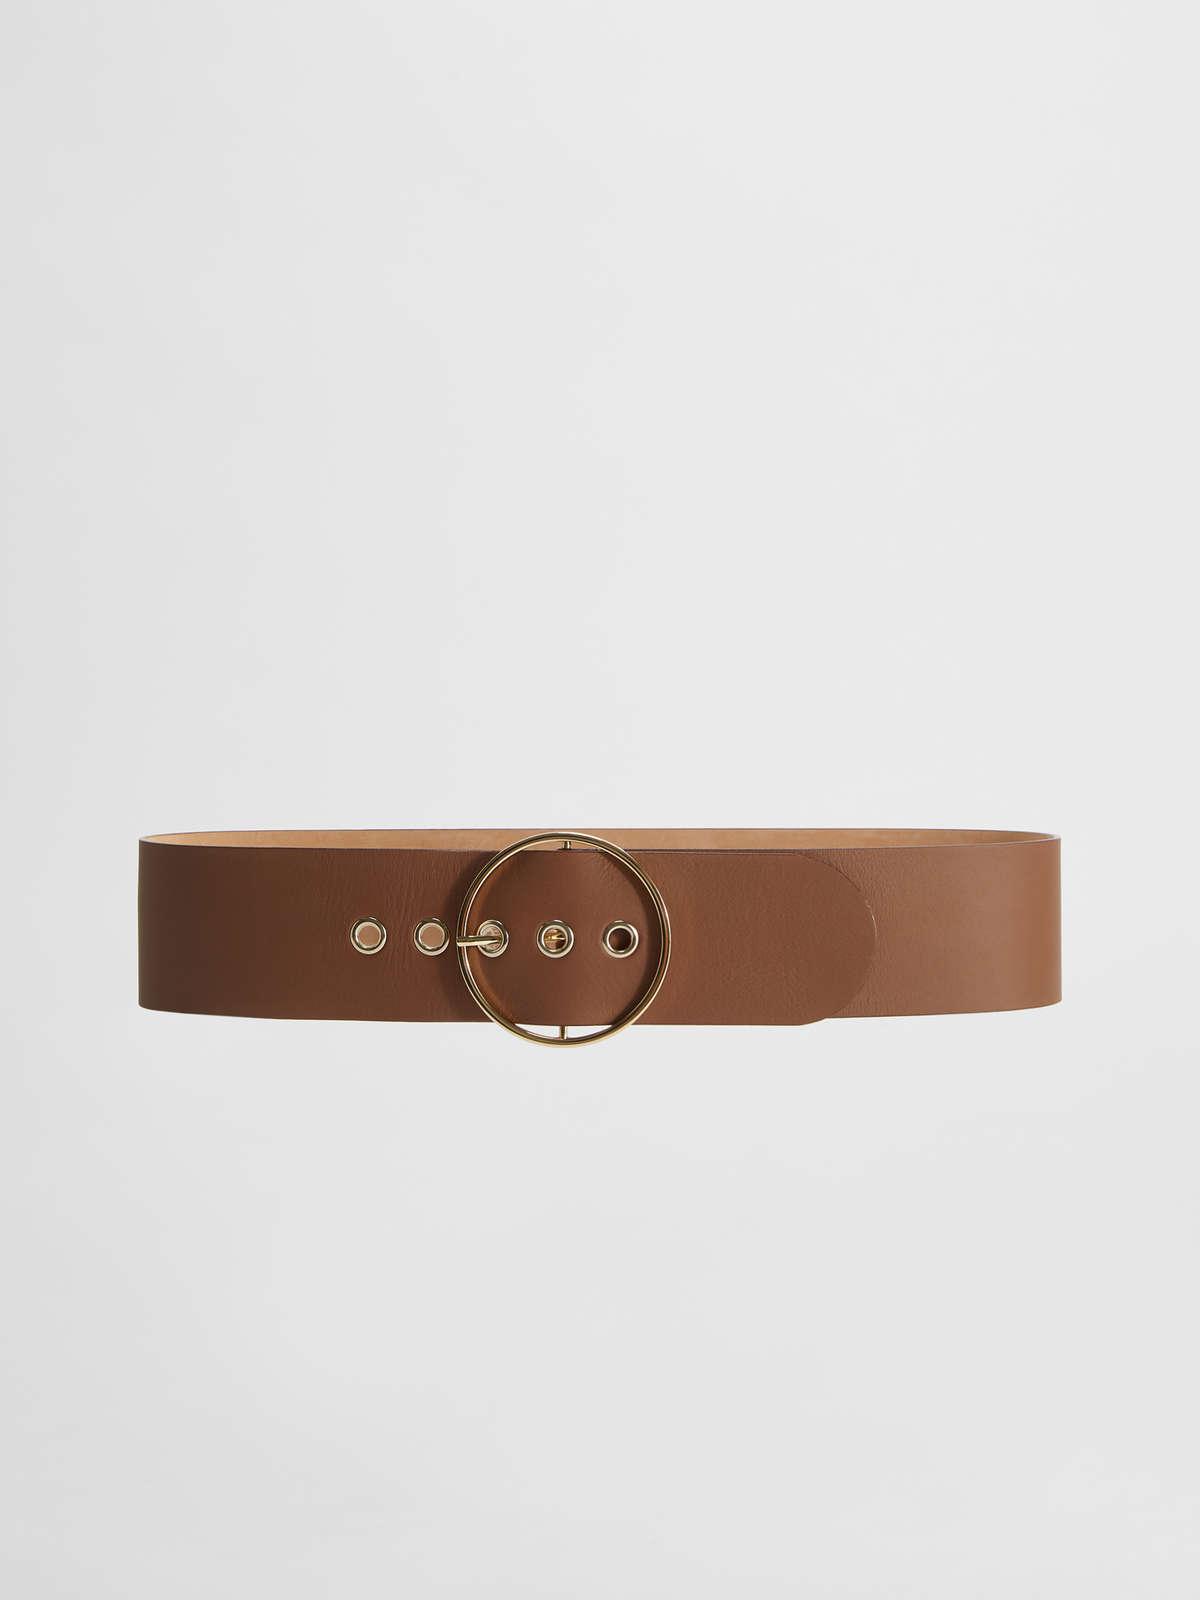 Smooth leather belt - Max Mara